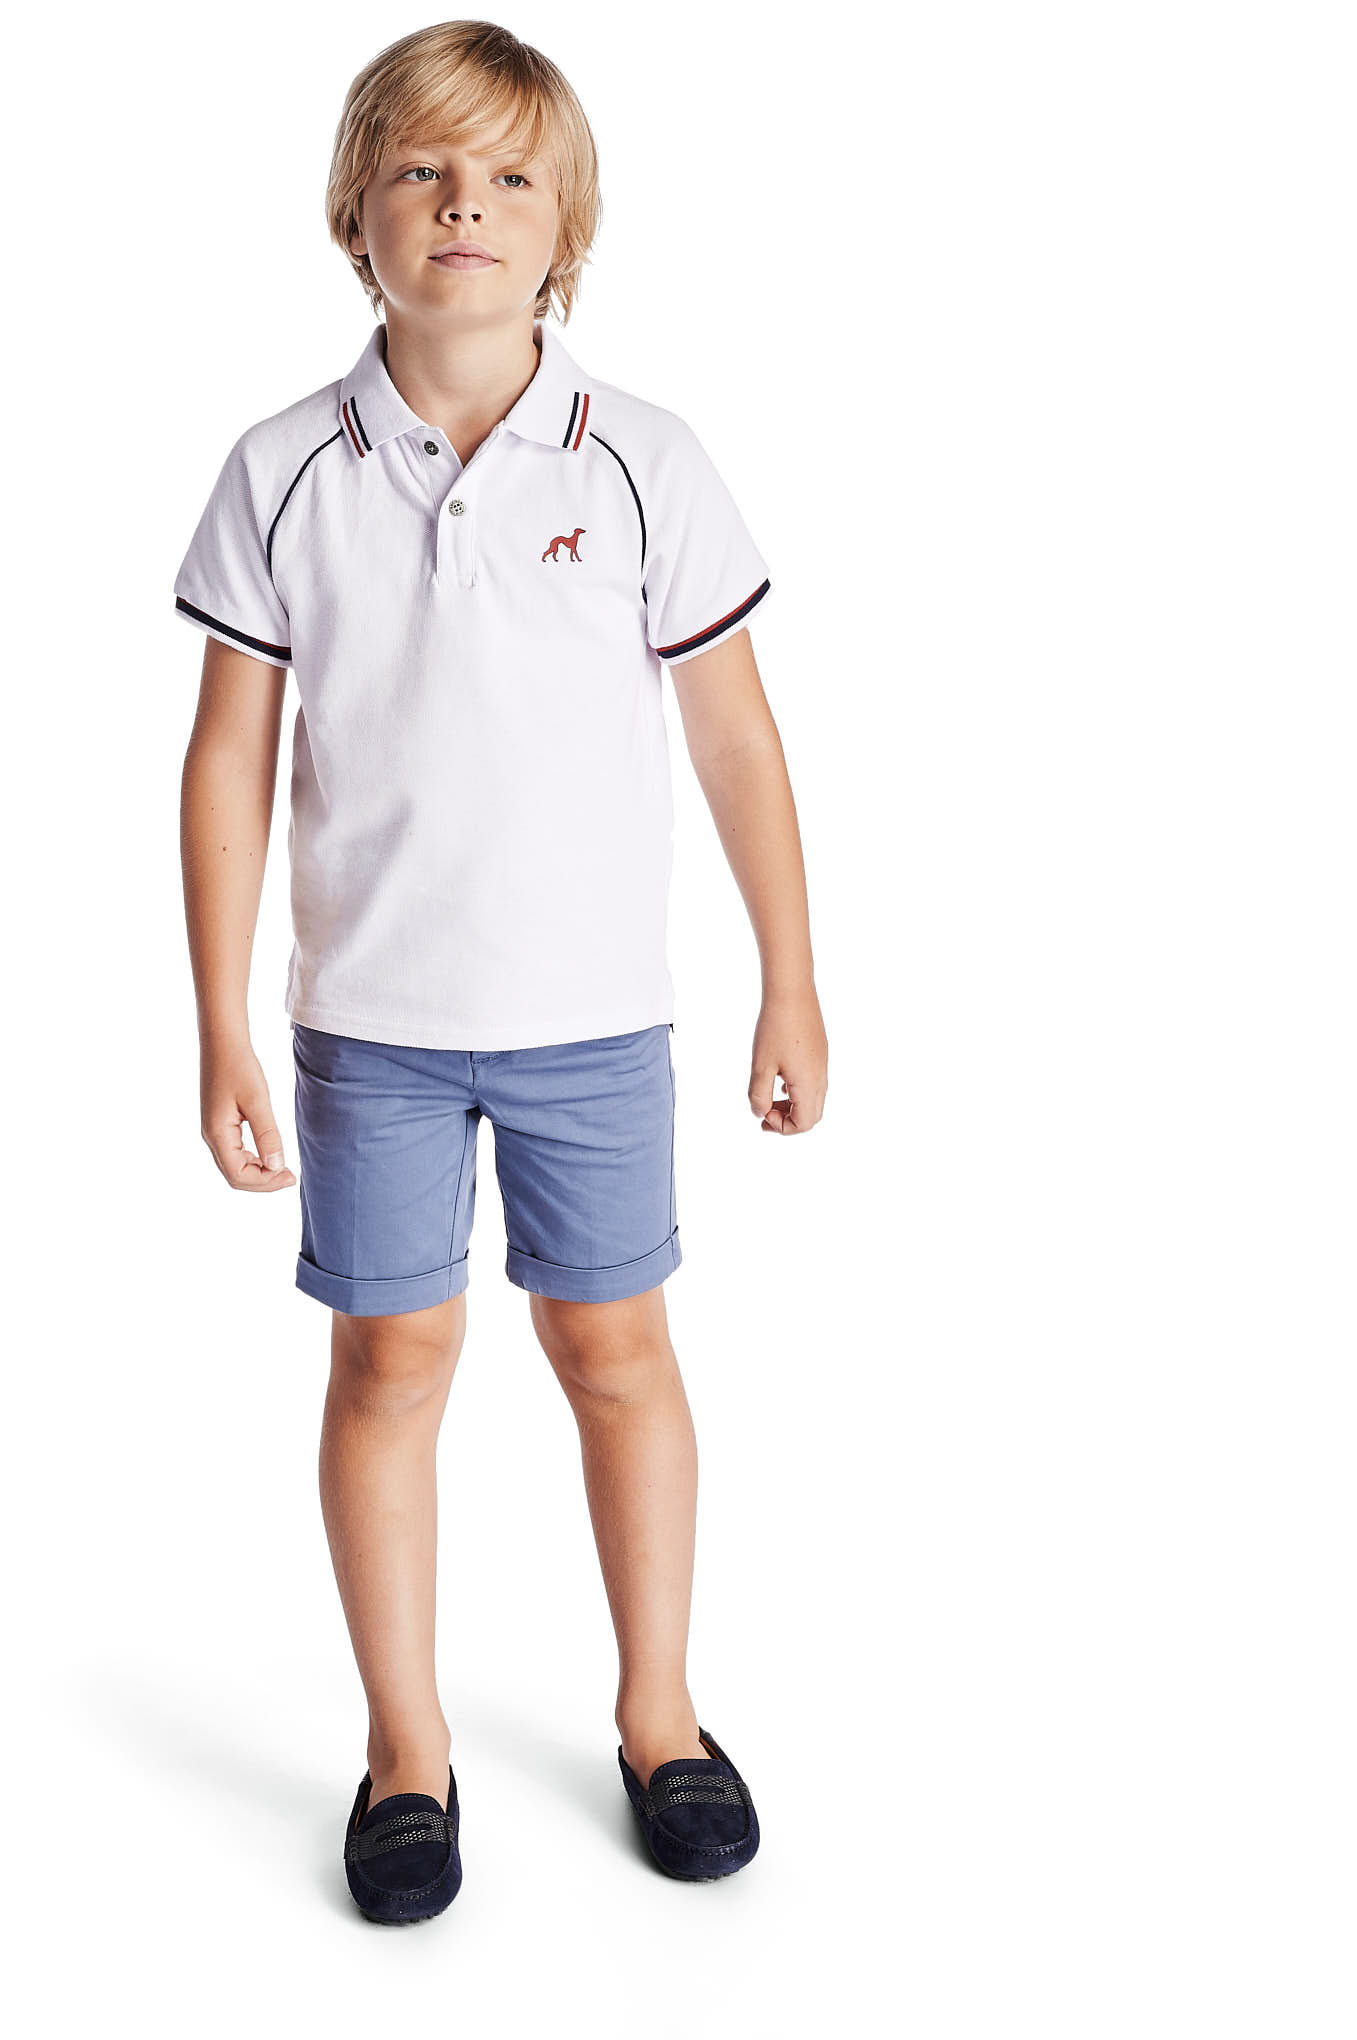 Polo Piquet White Sport Boy